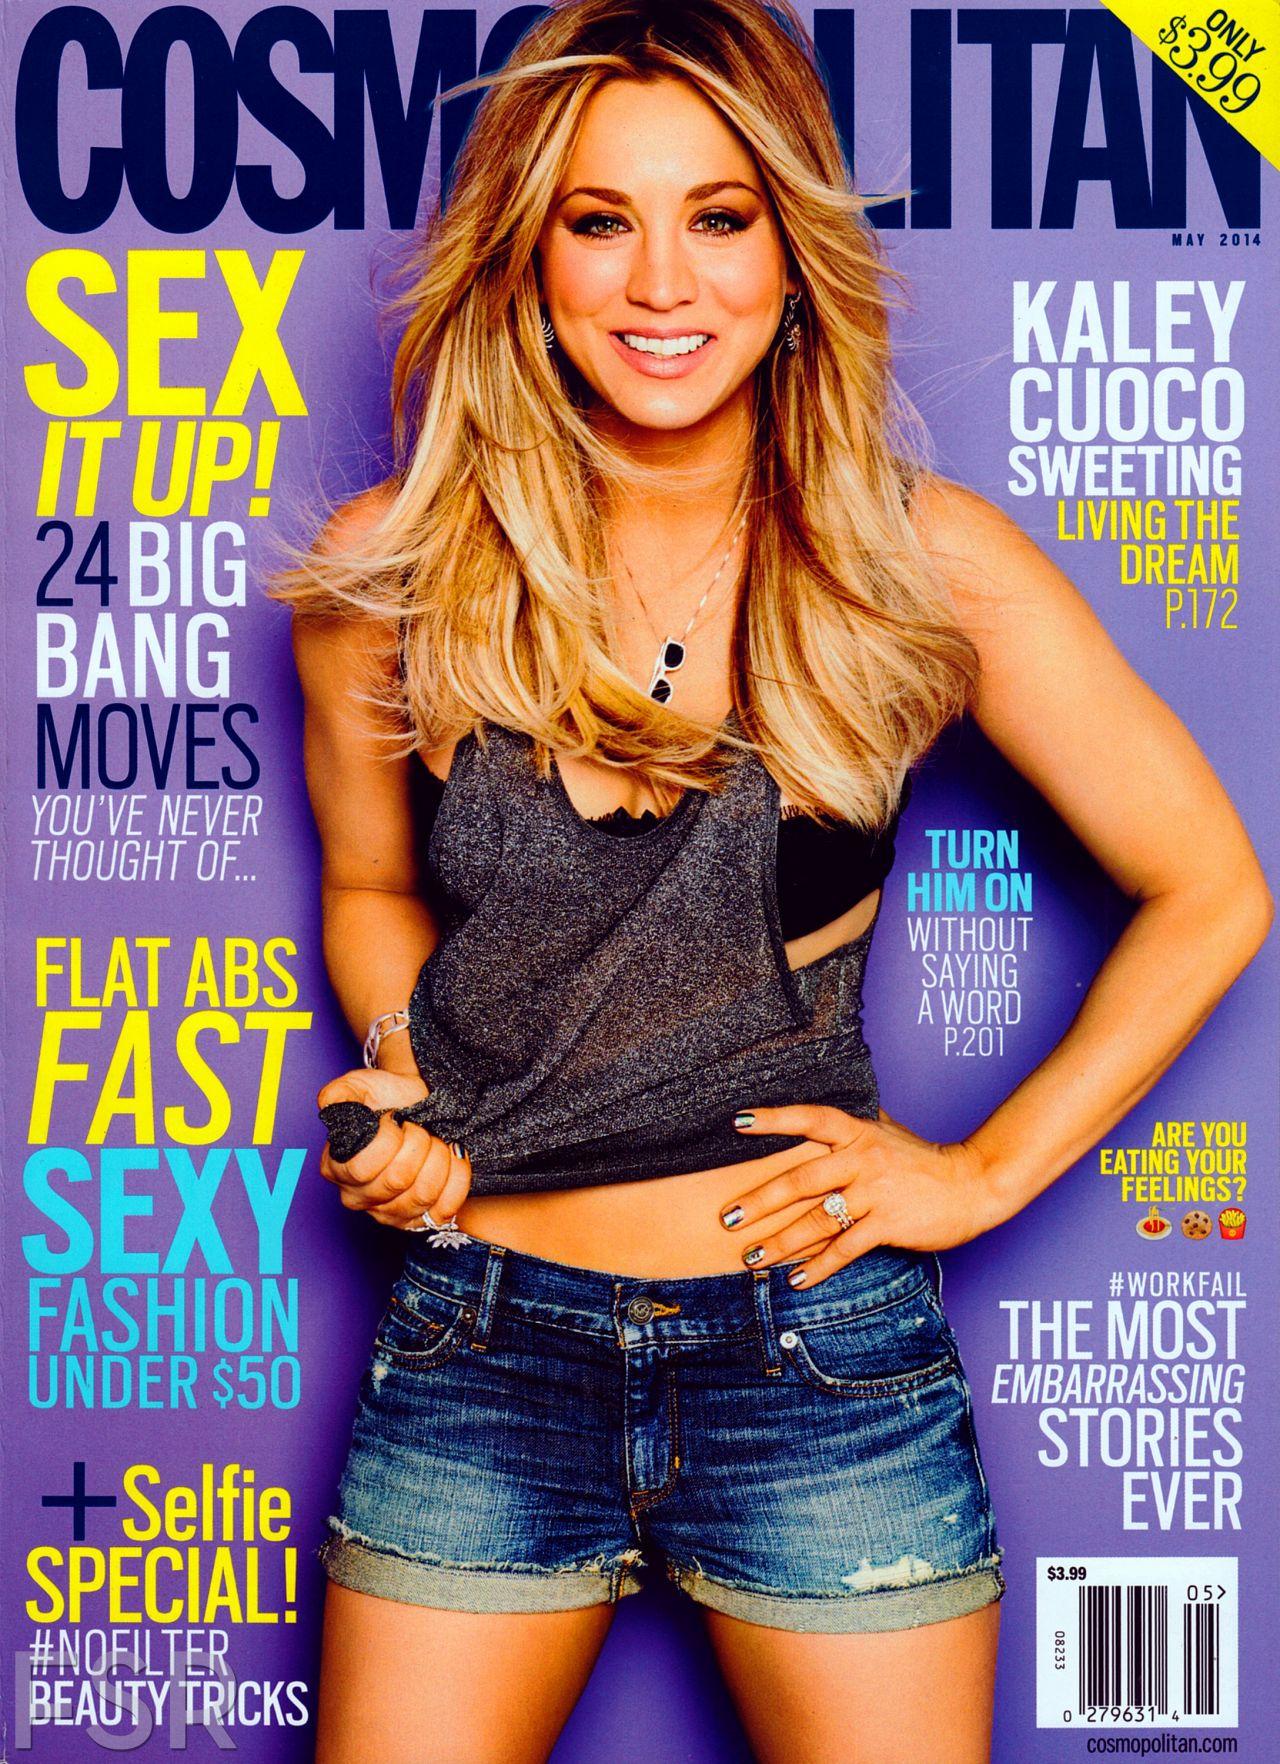 kaley cuoco cosmopolitan magazine may issue